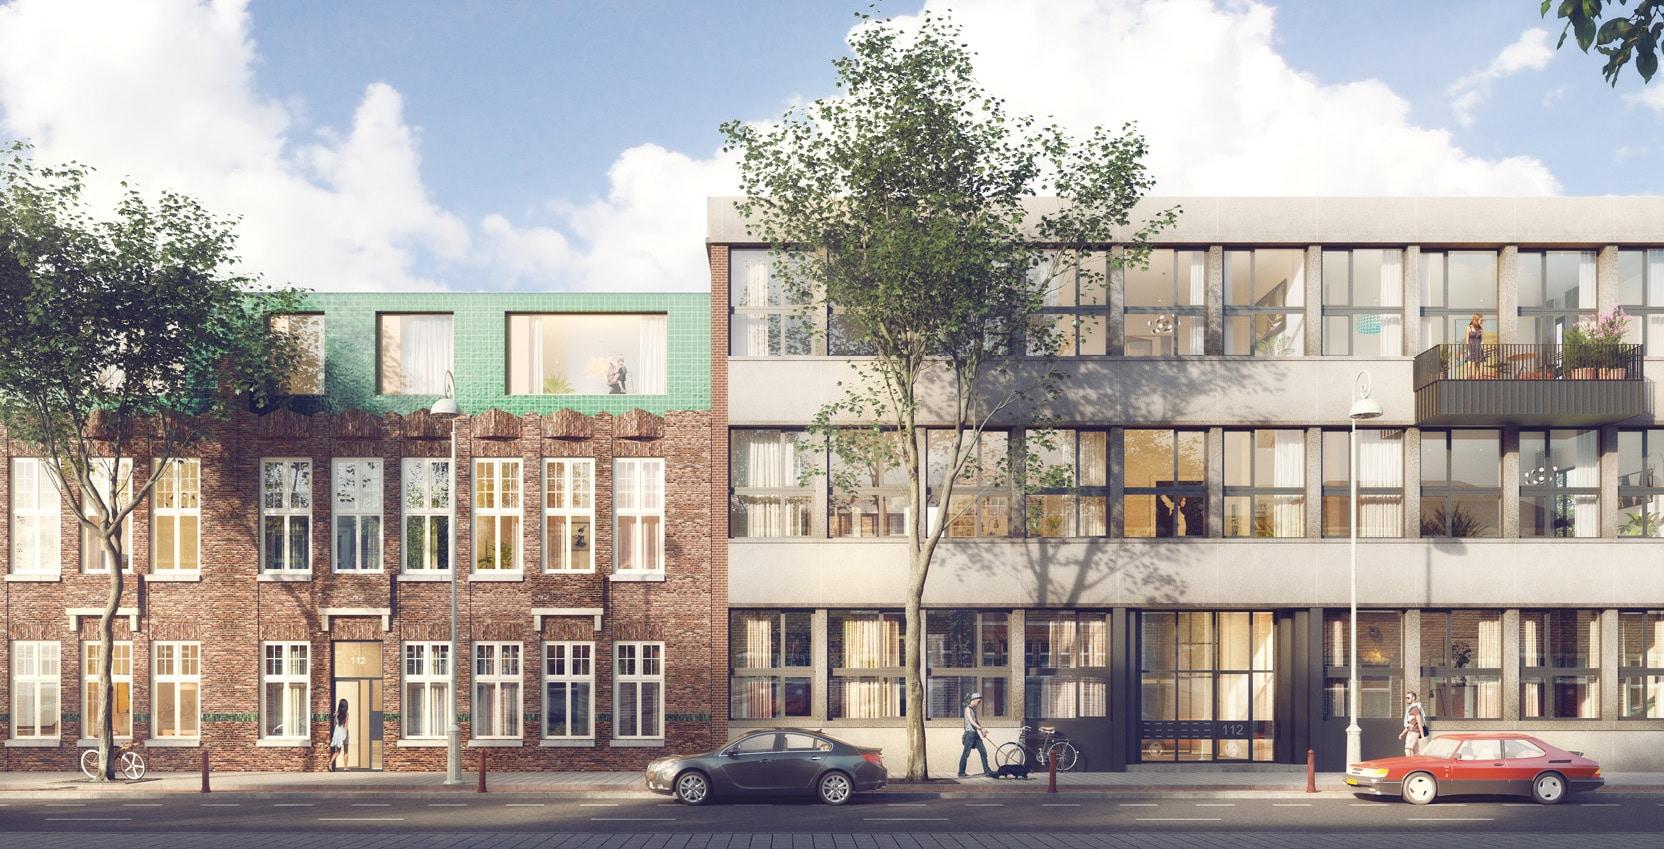 Modeschool Amsterdam: Gietvloeren